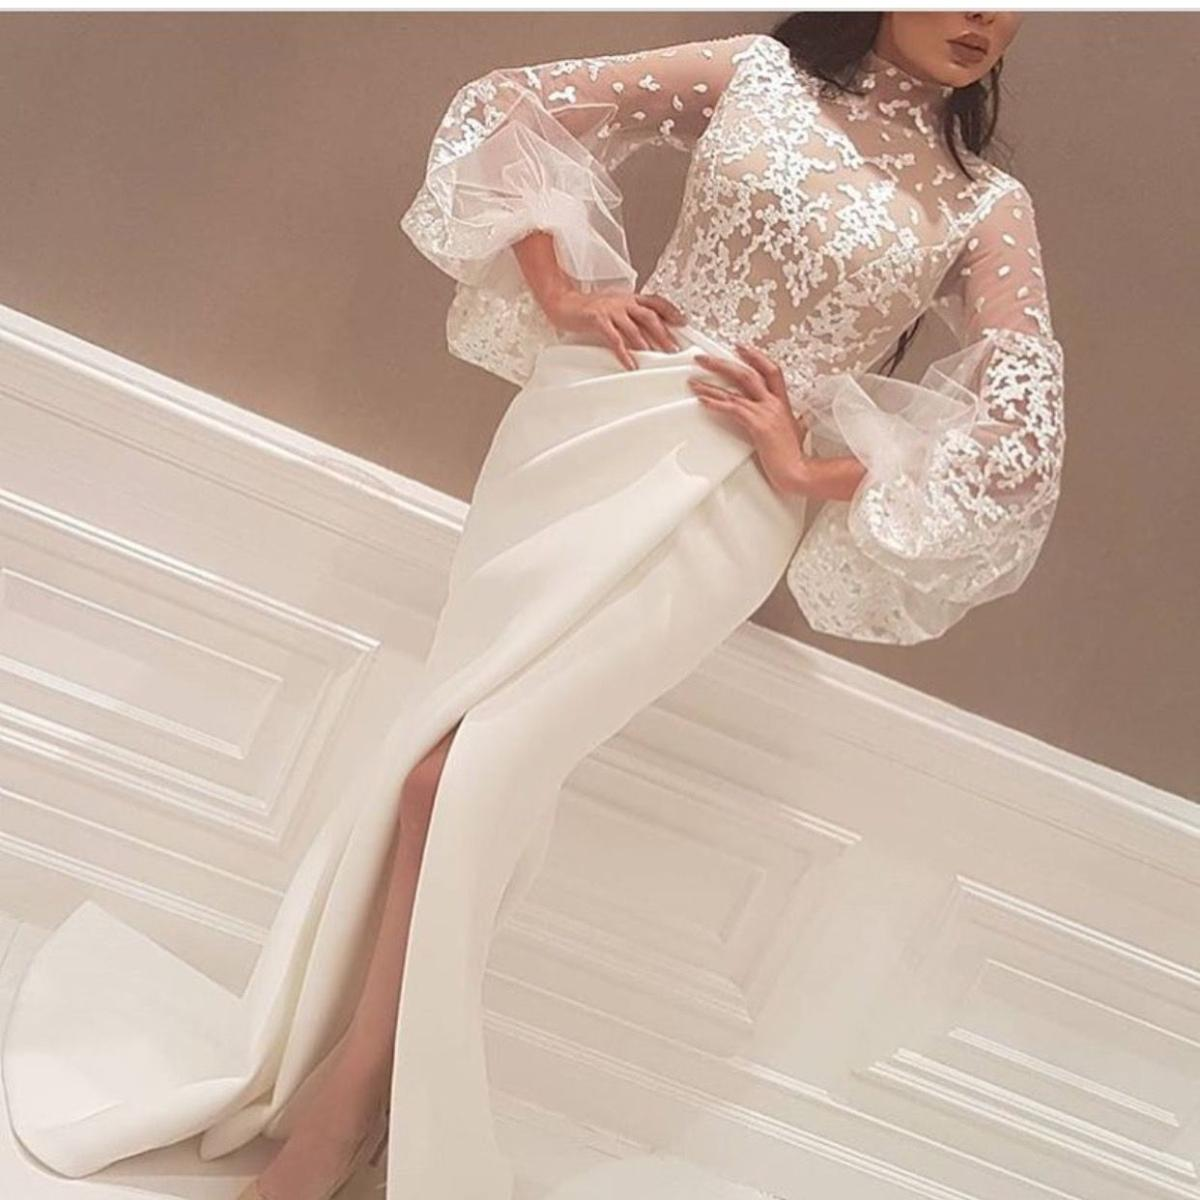 Long Arabic Evening Formal Dresses 2018 Mermaid Prom Dress High Neck Top  Illusion Lace Puff Sleeve Formal Party Dresses Evening Wear Runway Floor  Length ... 169beb6b2f35